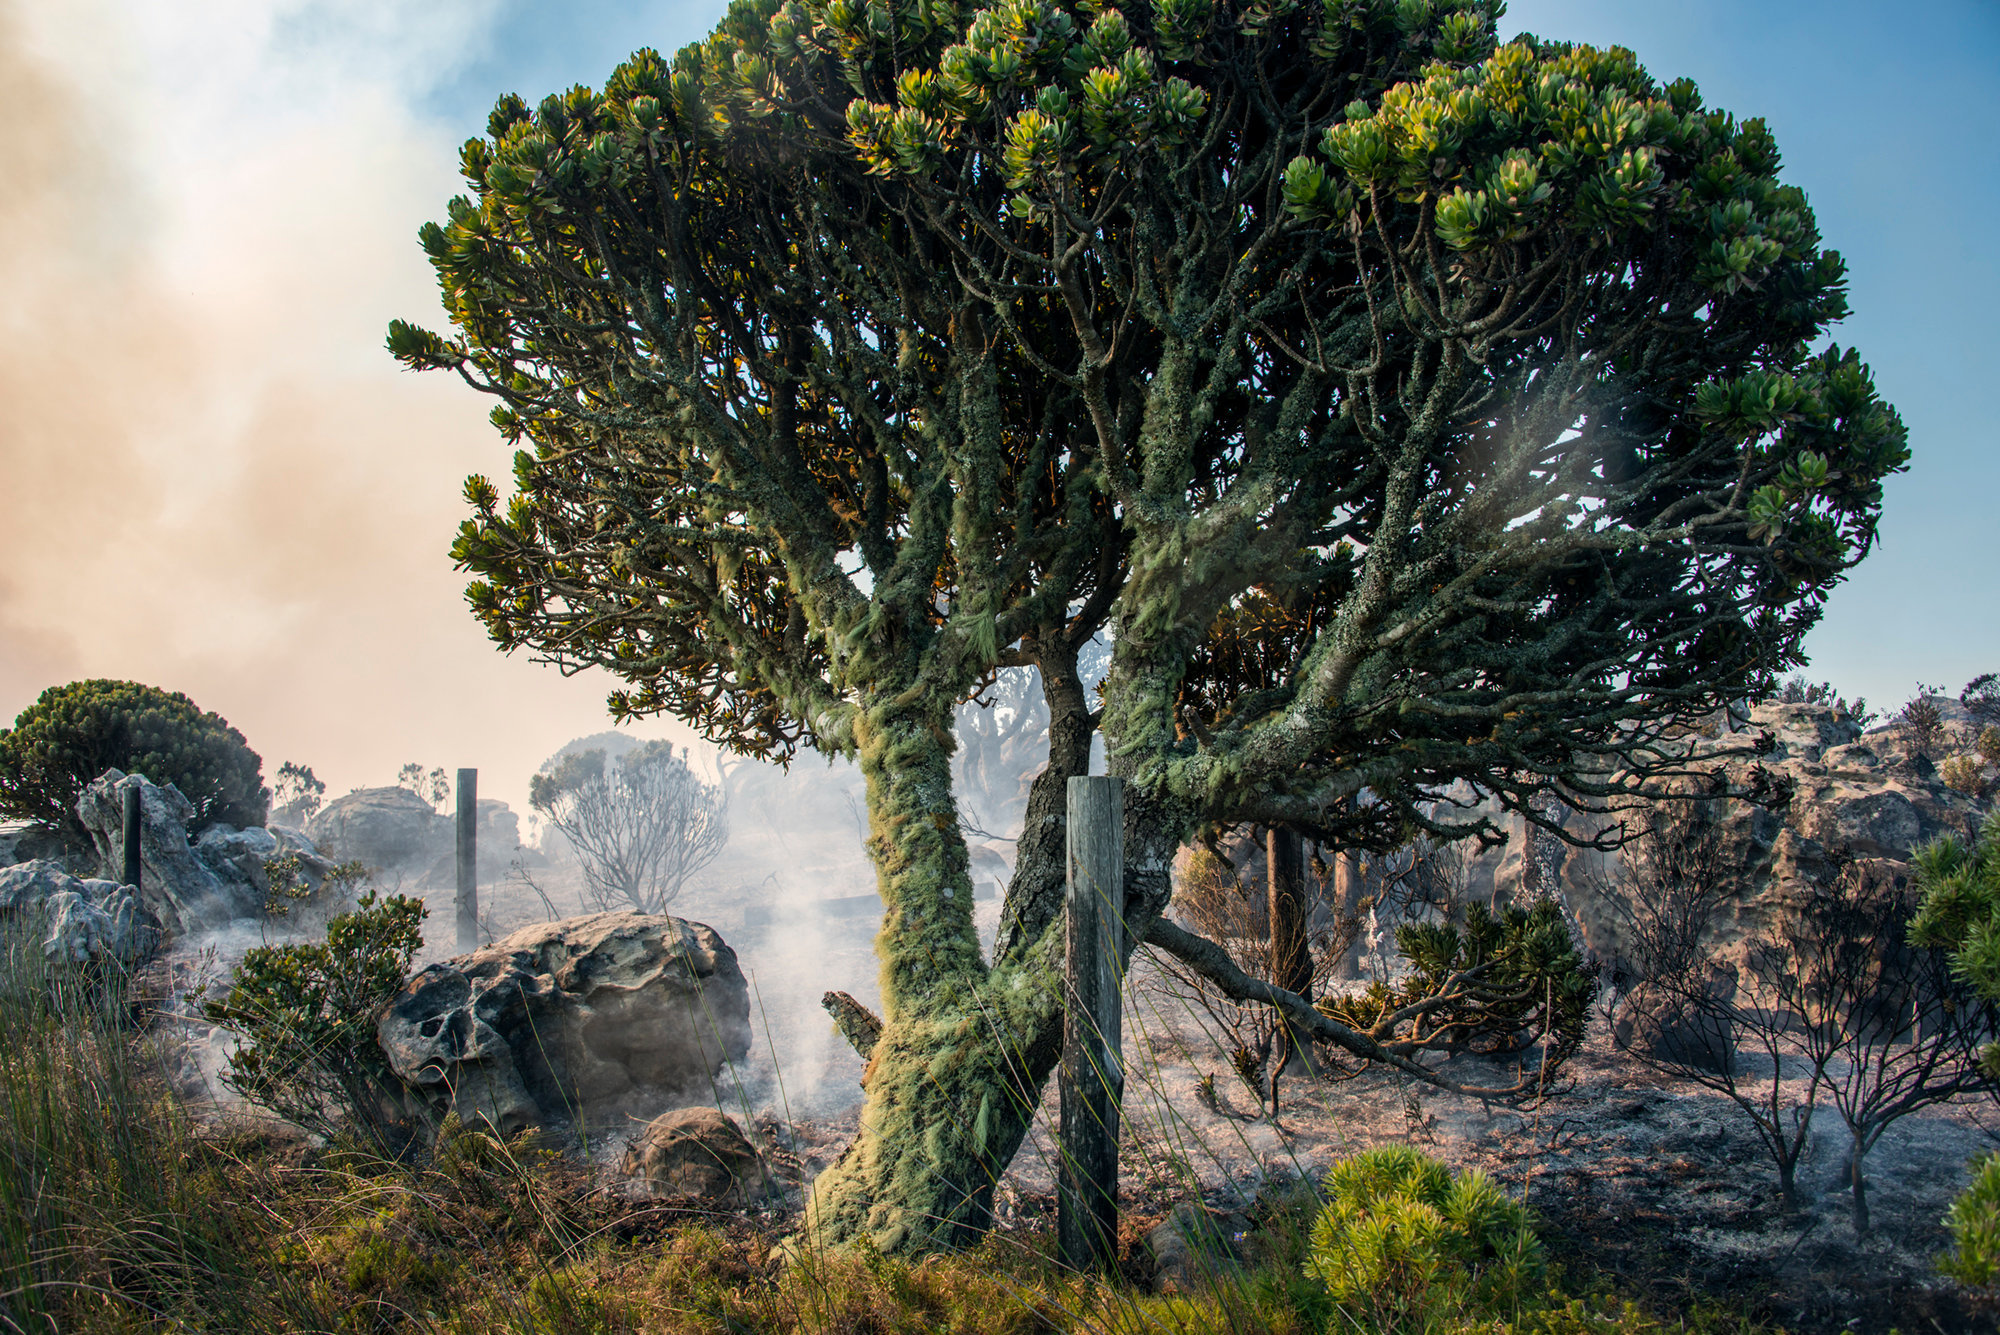 The Lichen Tree II